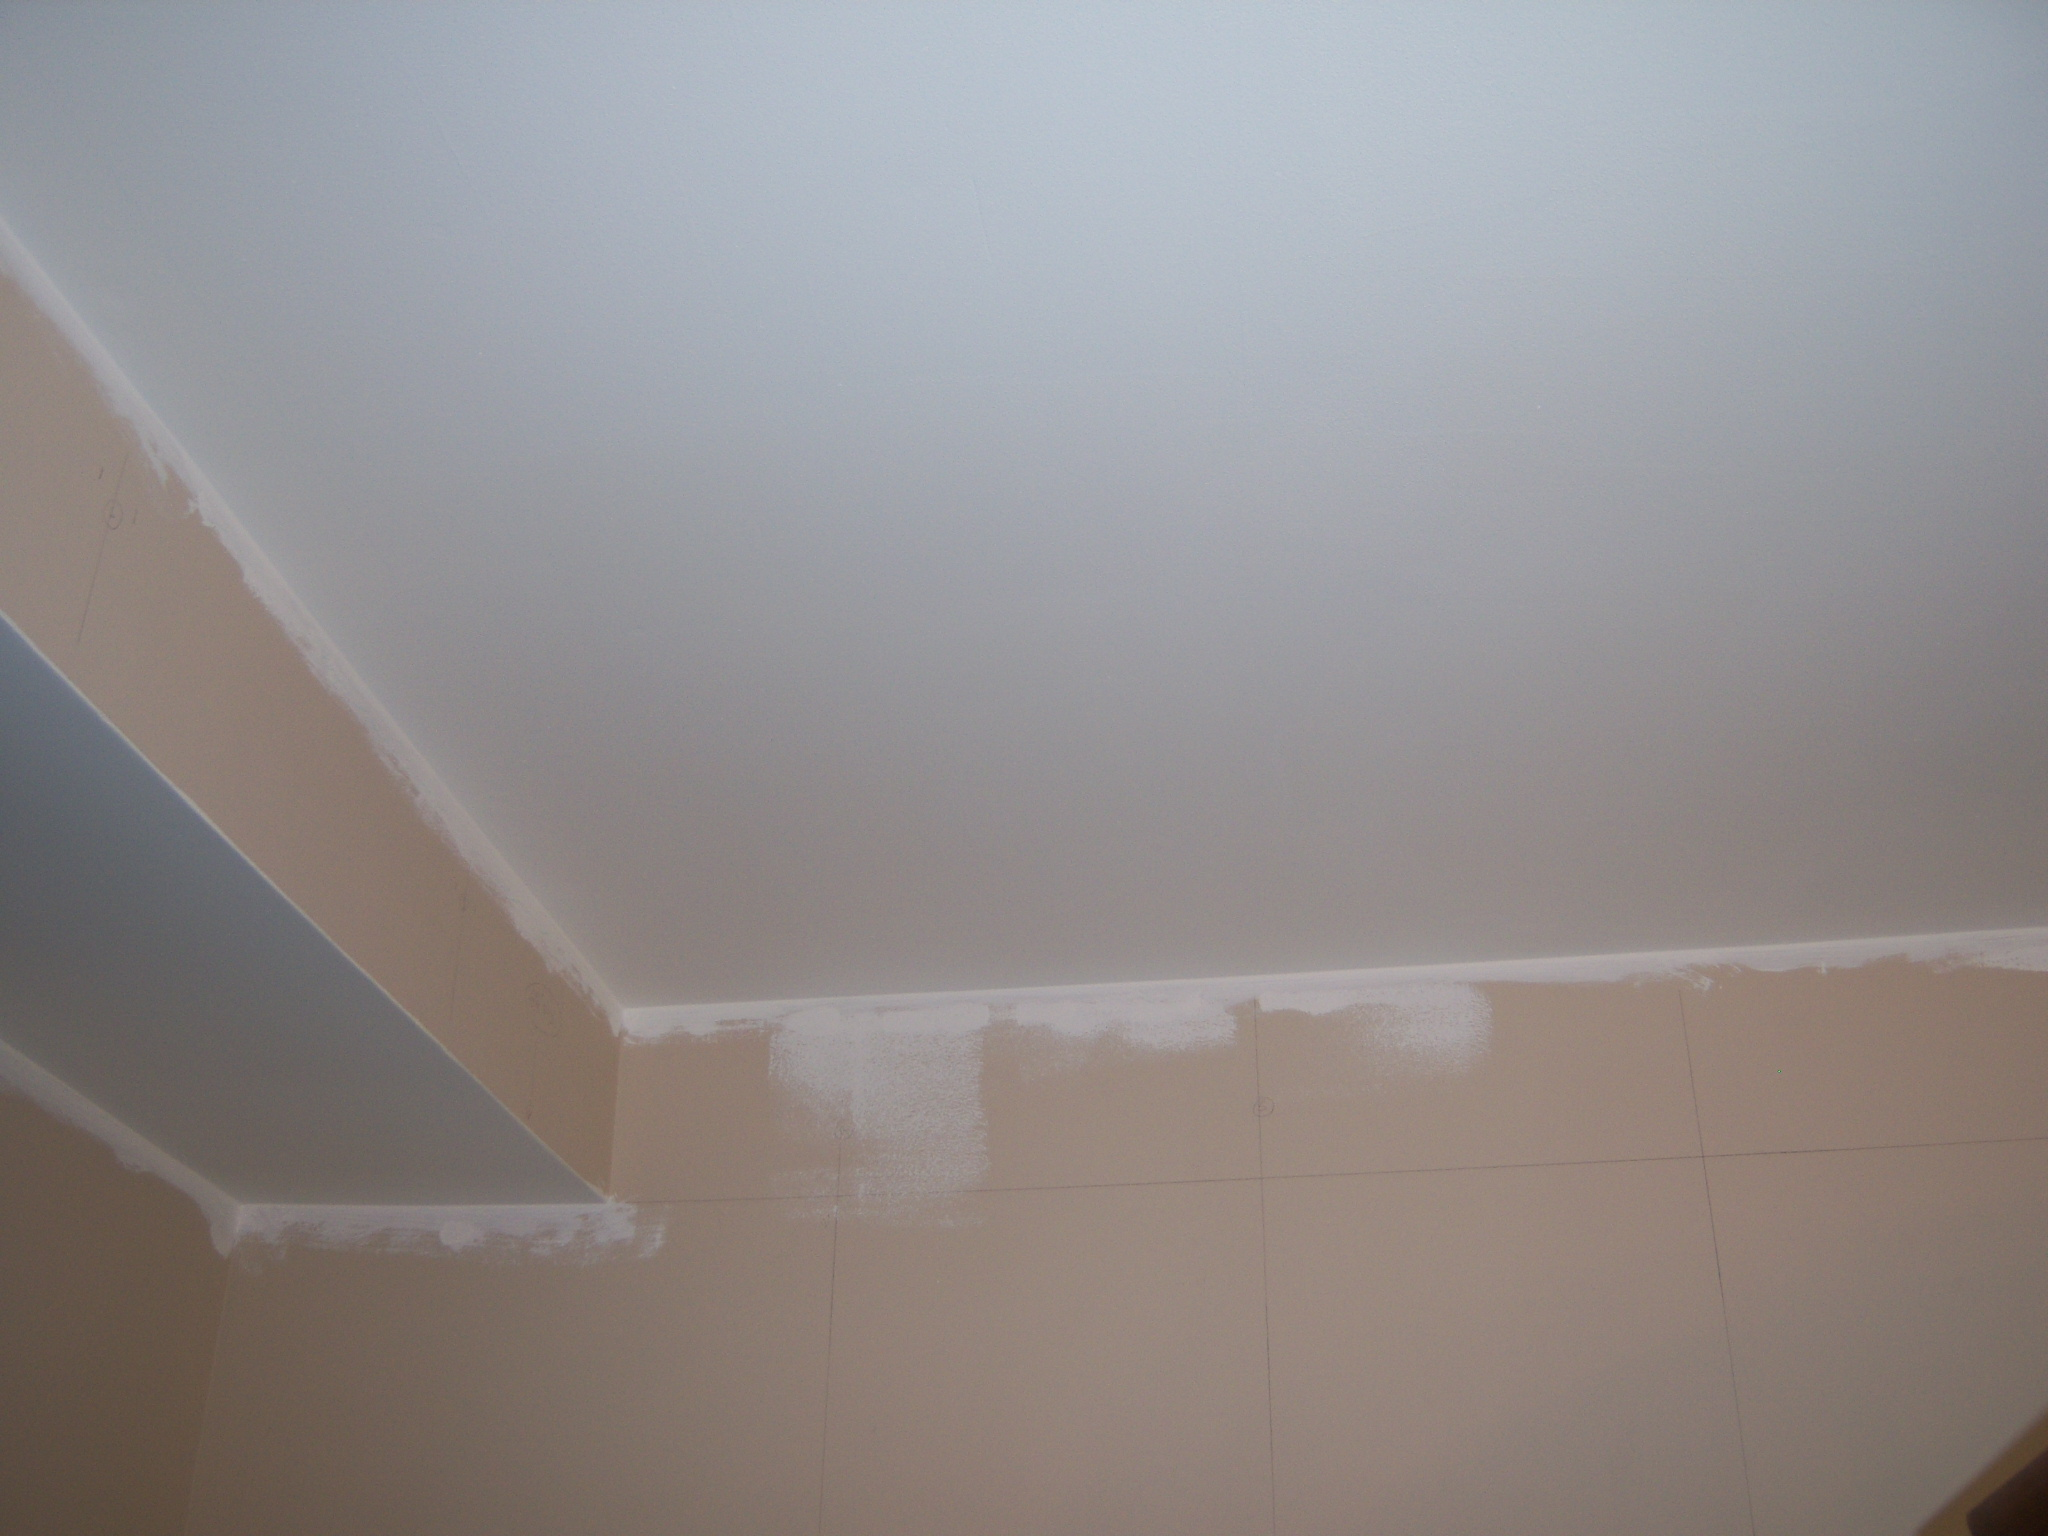 Ceiling Repair Drywall